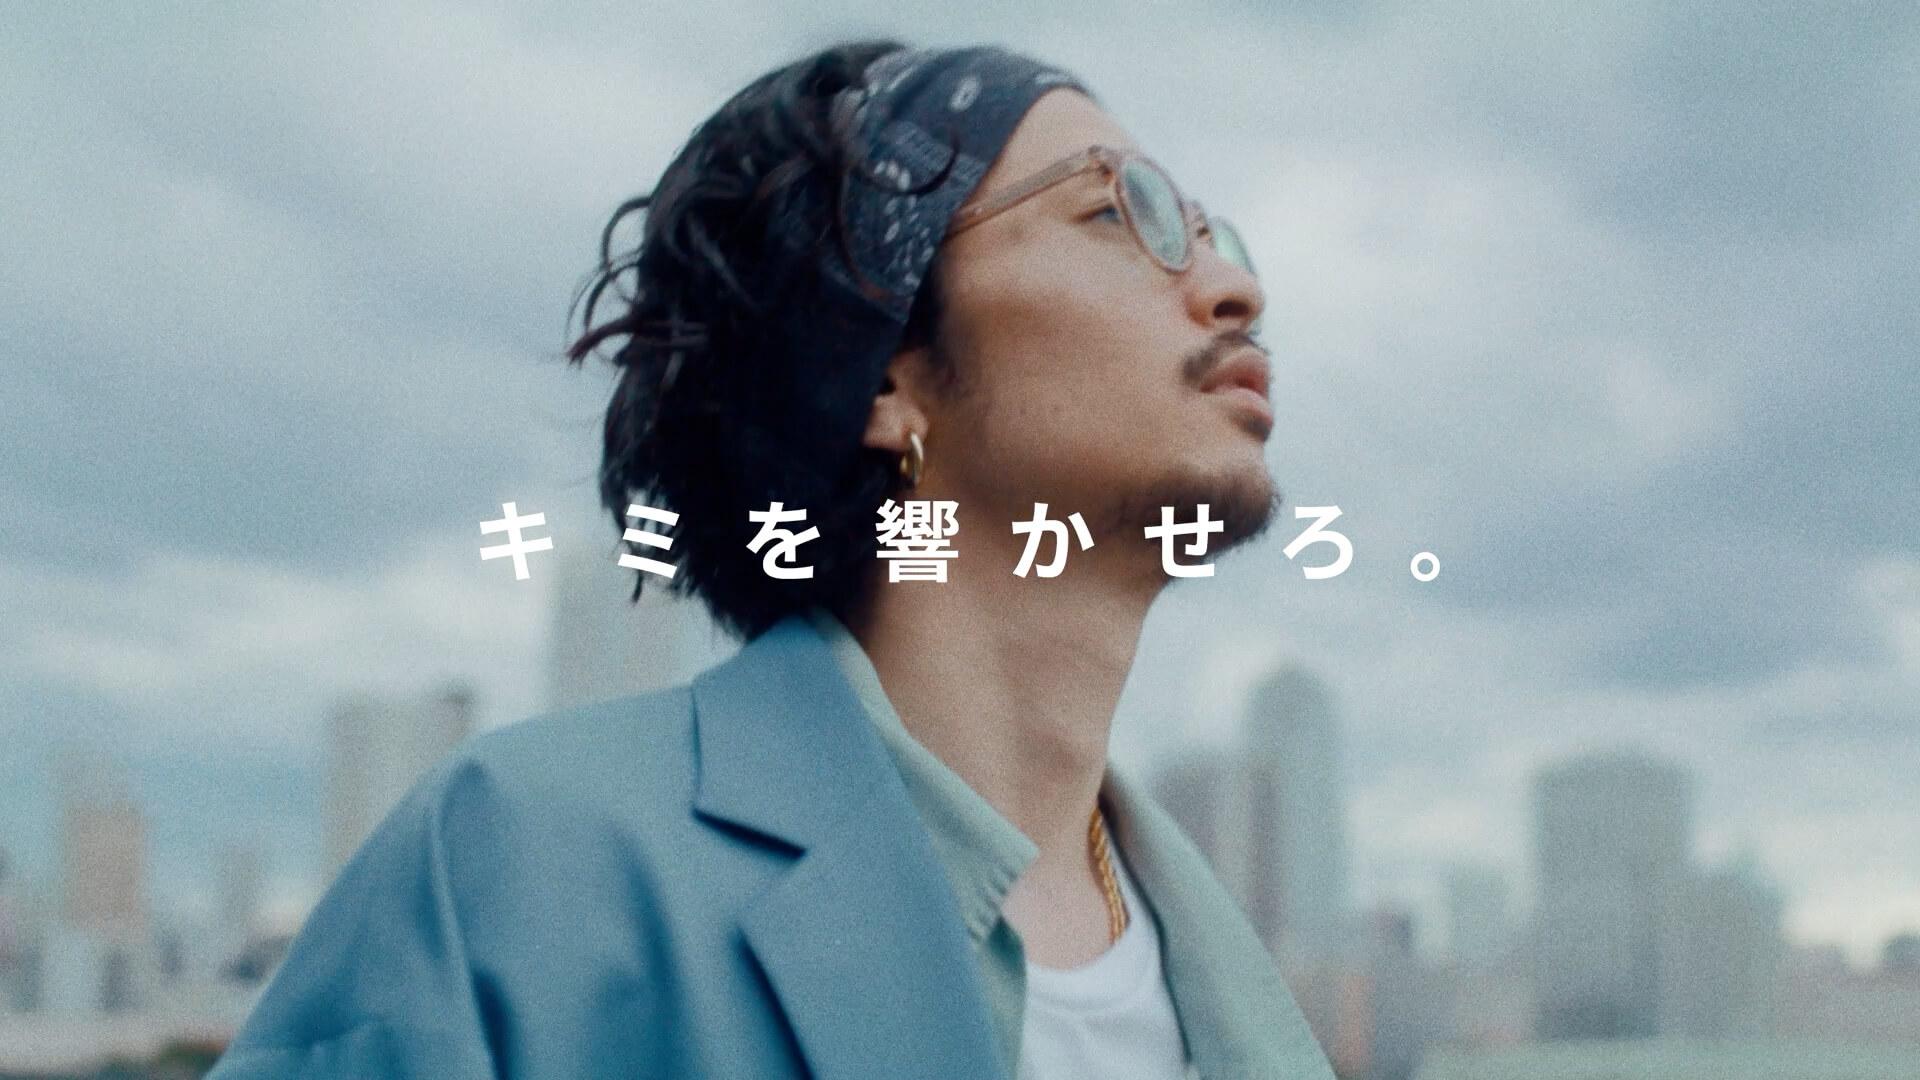 adidas Originals『FORUM』のプロモーションフィルムが公開!King Gnu常田大希が出演 life210716_adidasoriginals_forum_8